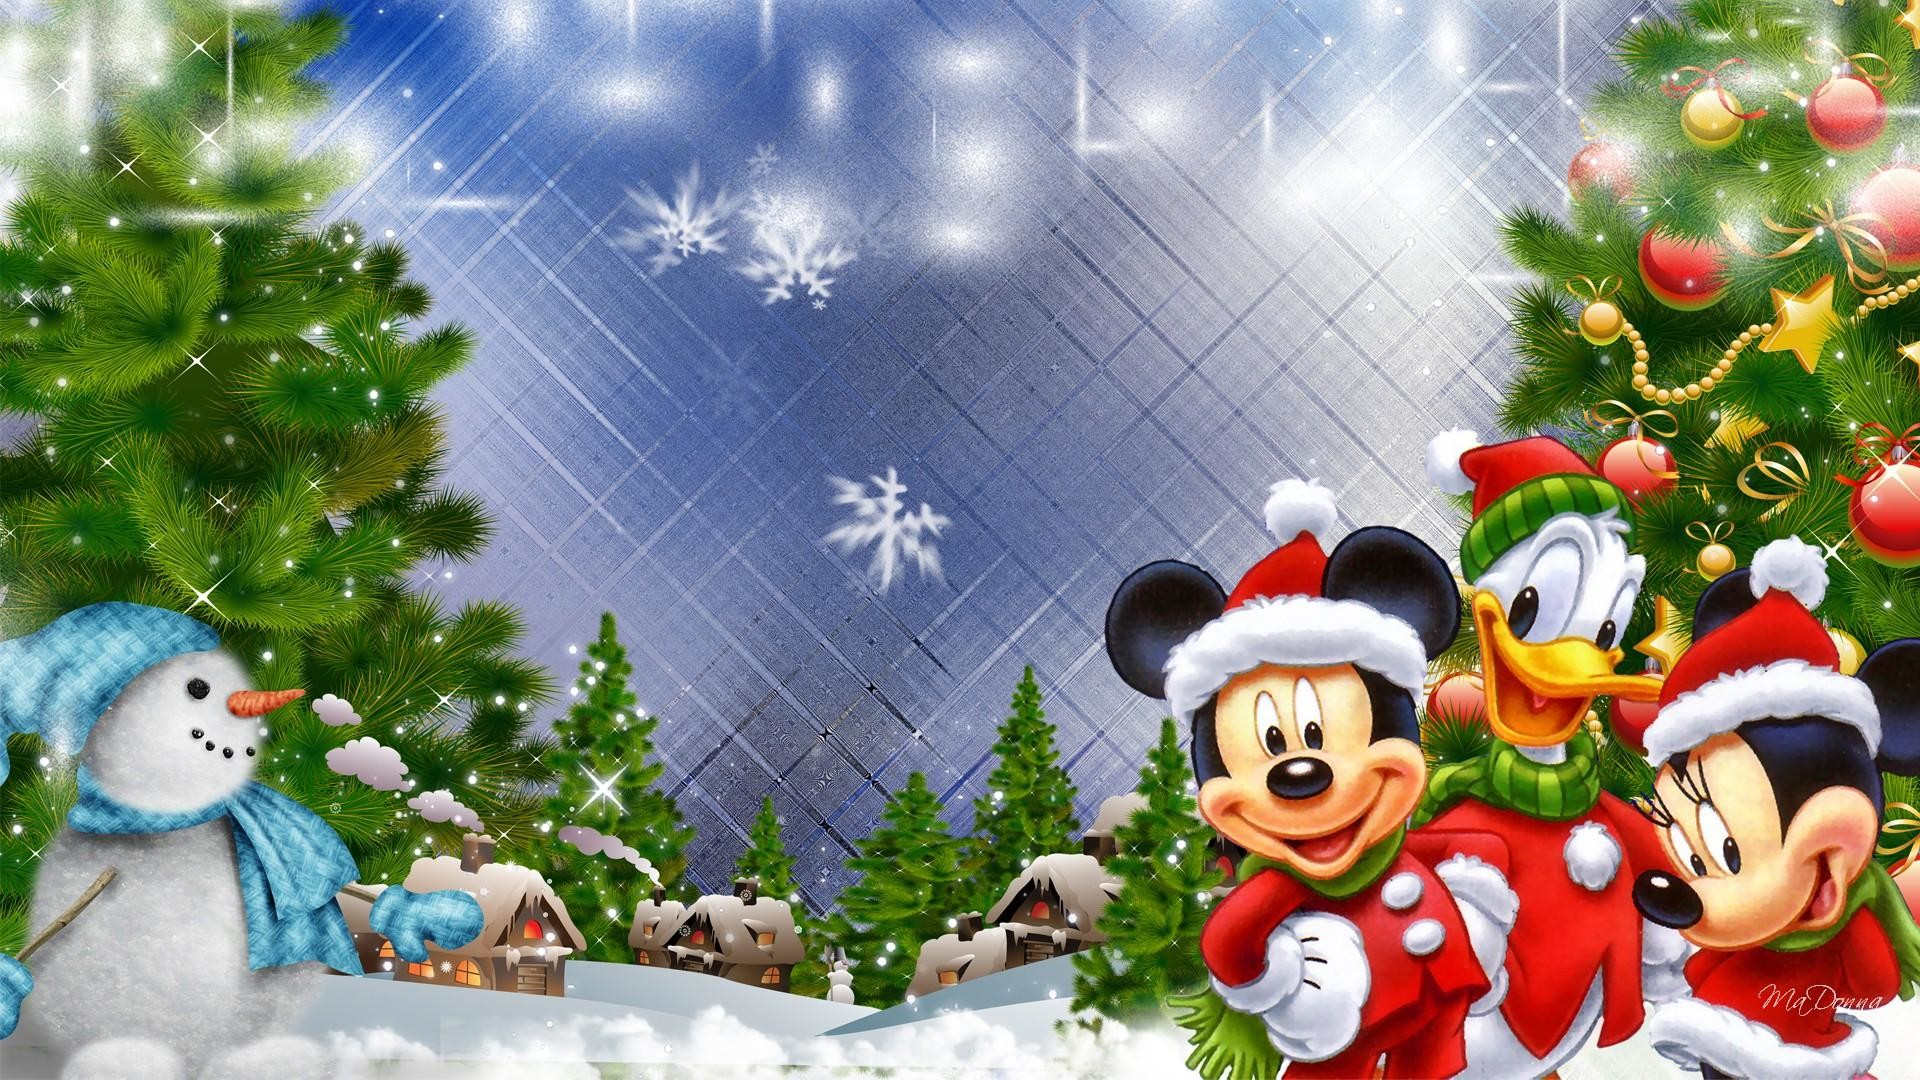 mickey mouse christmas wallpaper  u00b7 u2460 wallpapertag